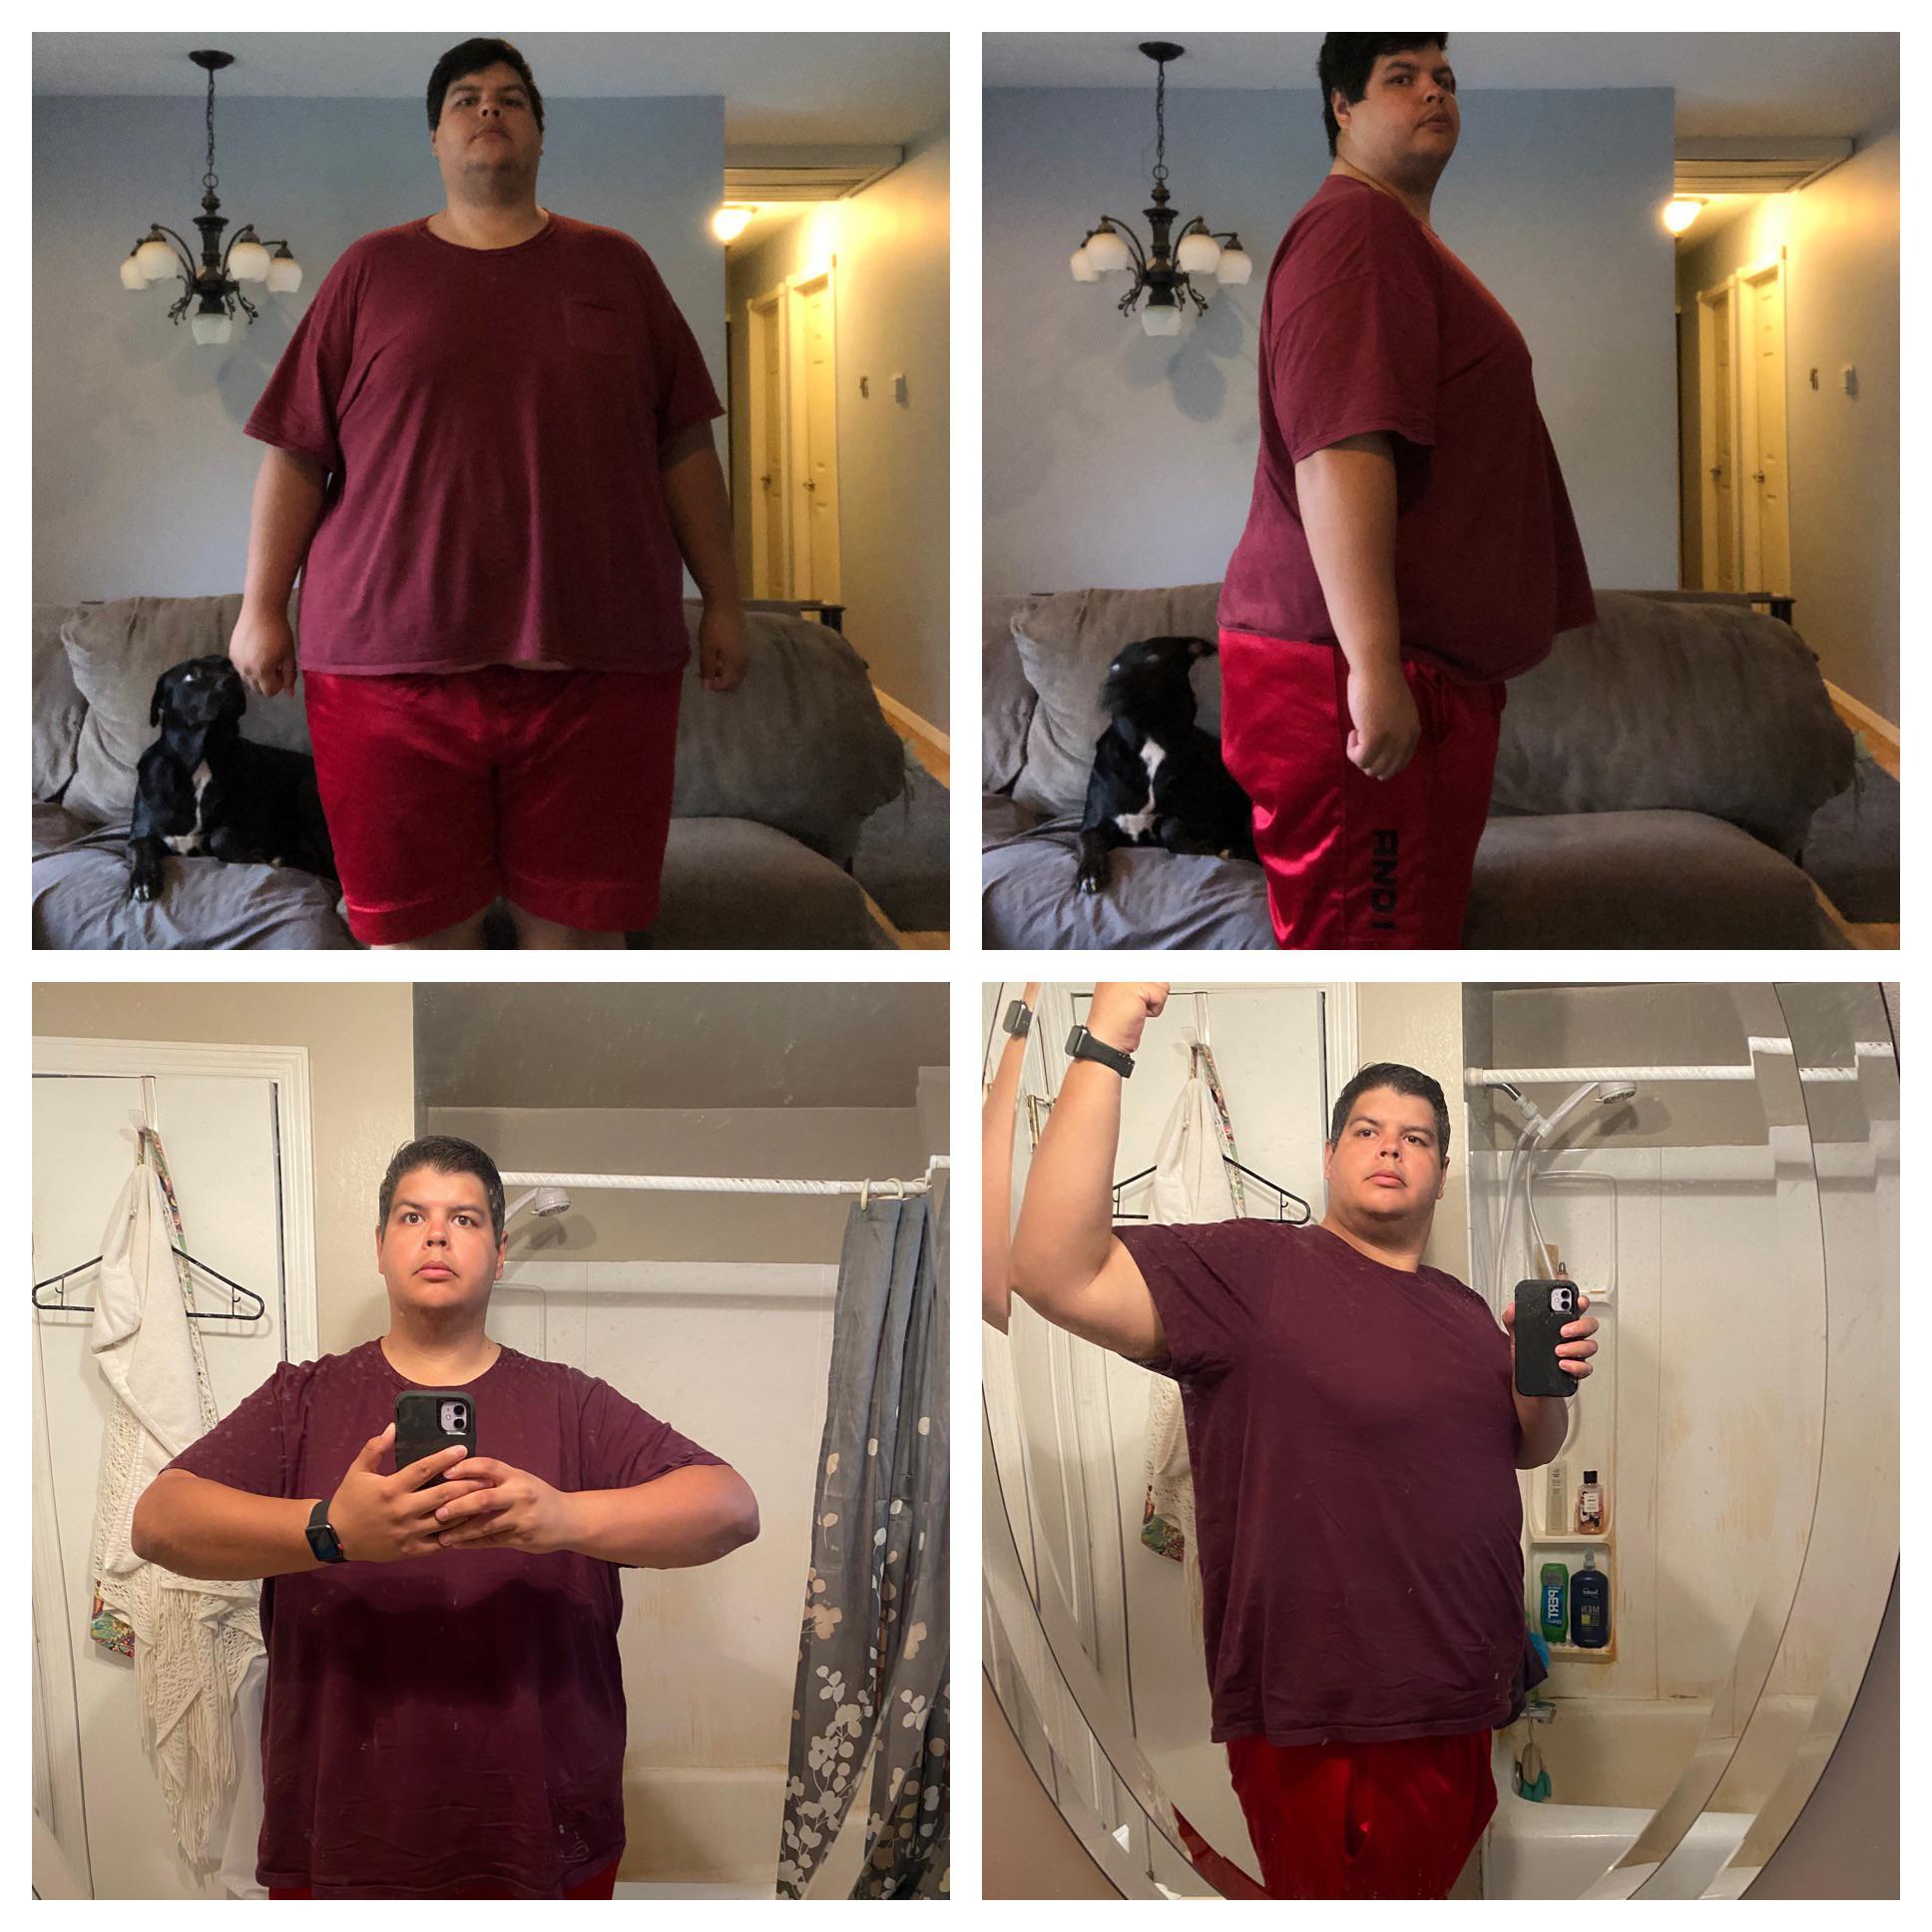 74 lbs Fat Loss 6 foot Male 423 lbs to 349 lbs